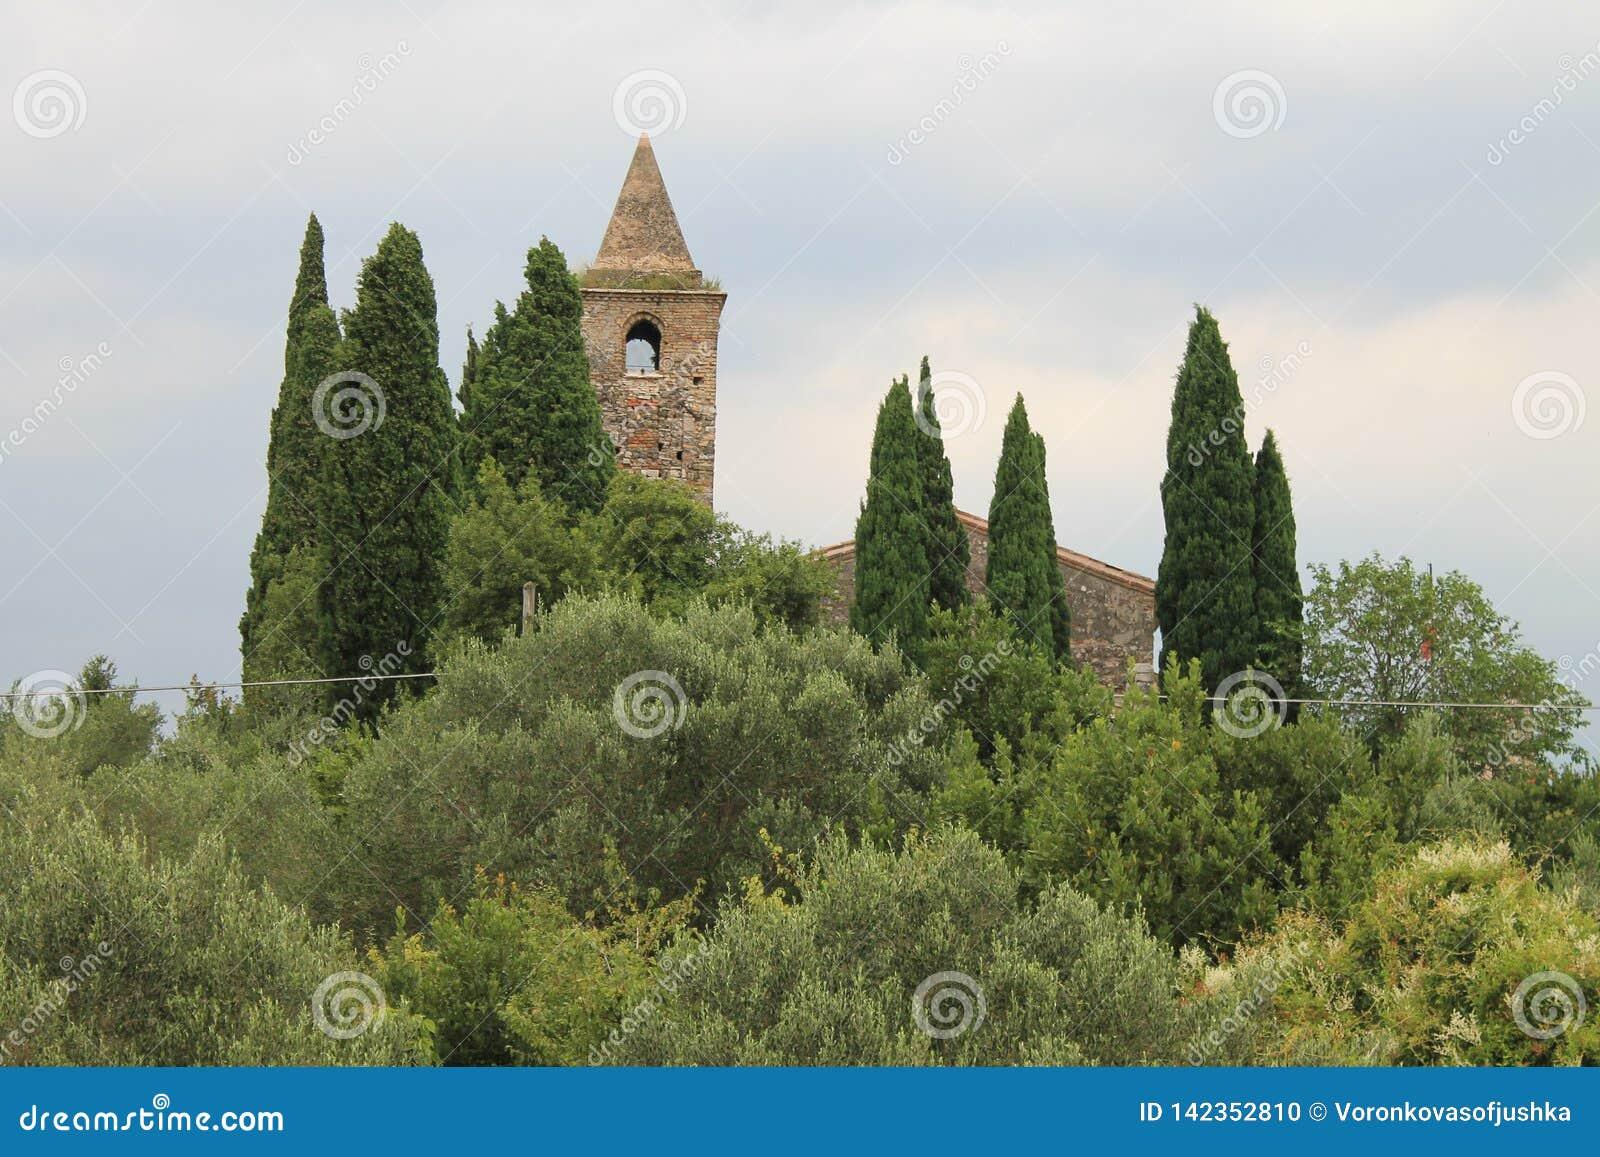 Ancient Church of San Pietro in Mavino in Sirmione Italy